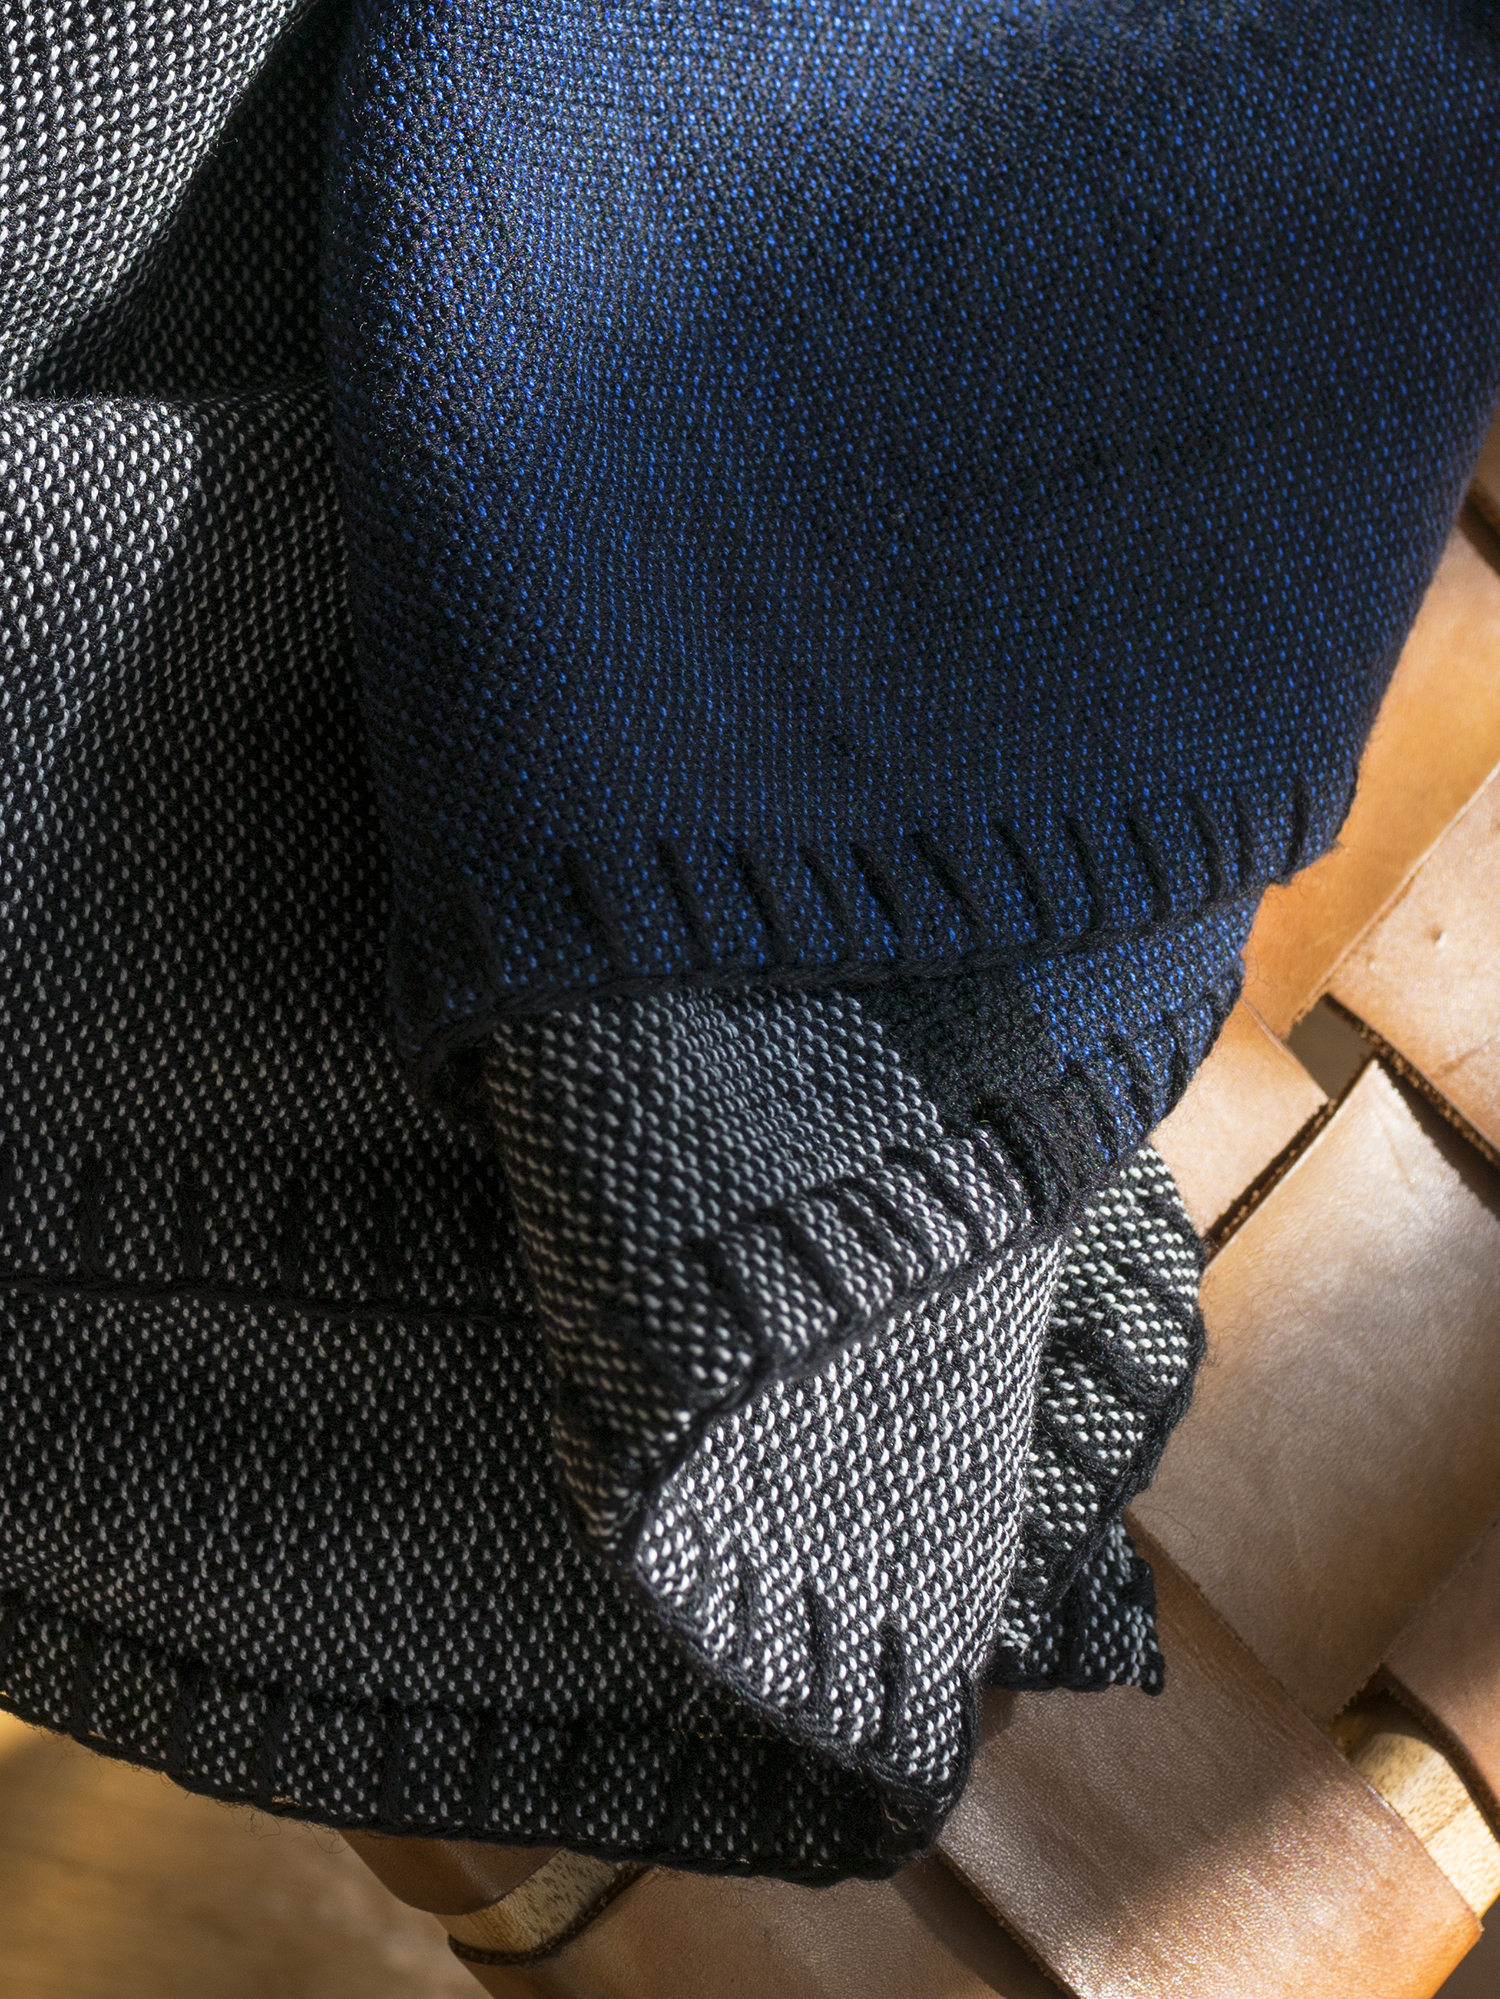 Handwoven Indigo Blanket